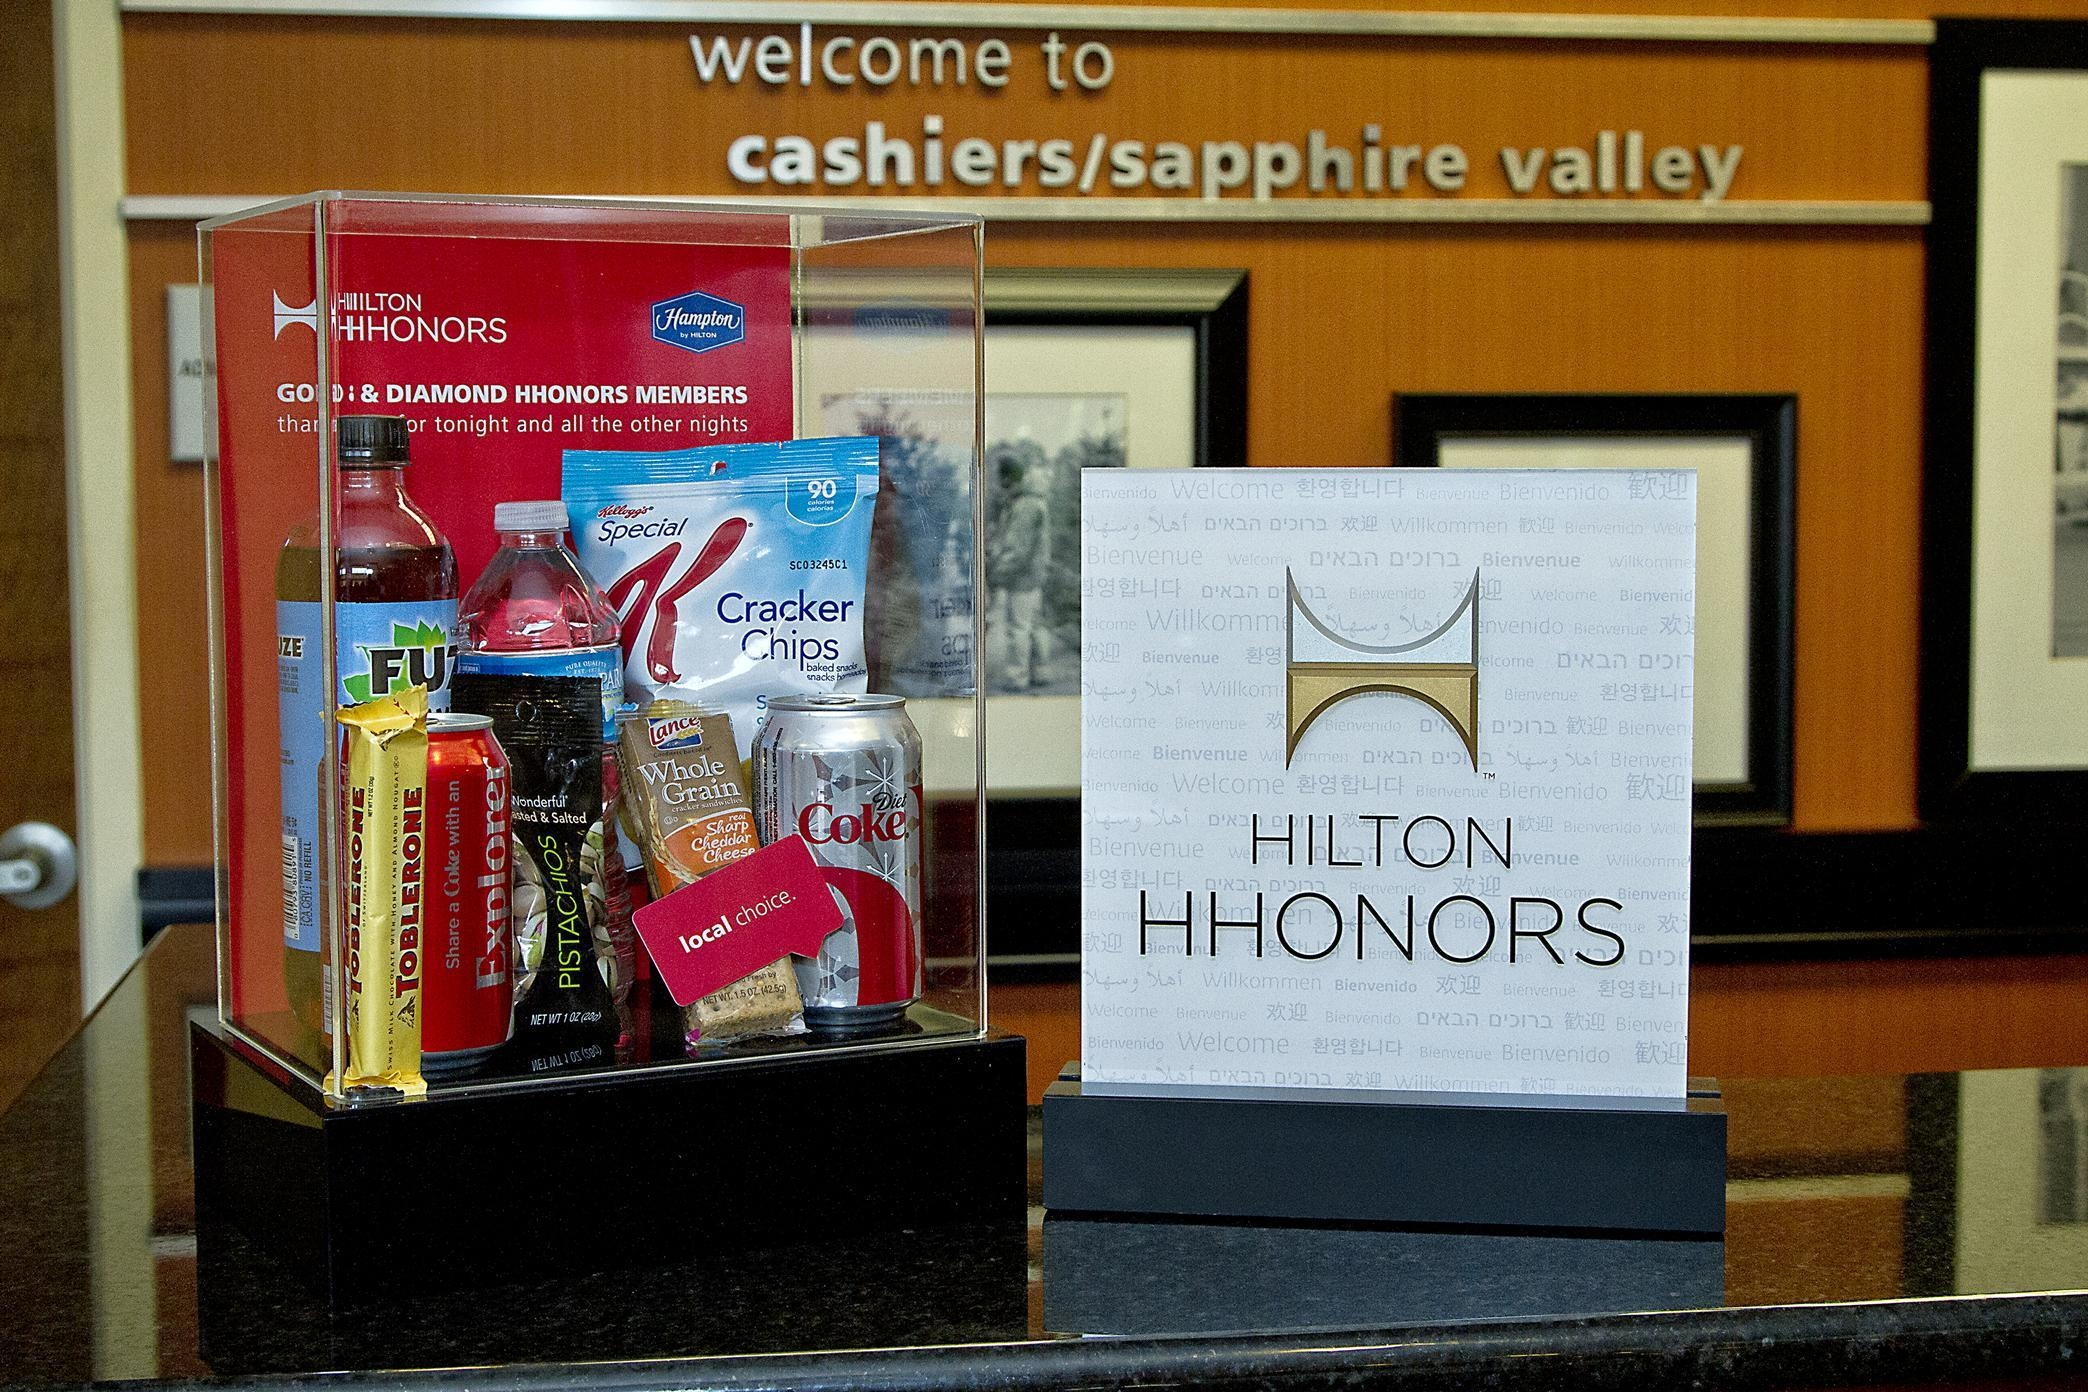 Hampton Inn & Suites Cashiers-Sapphire Valley image 16